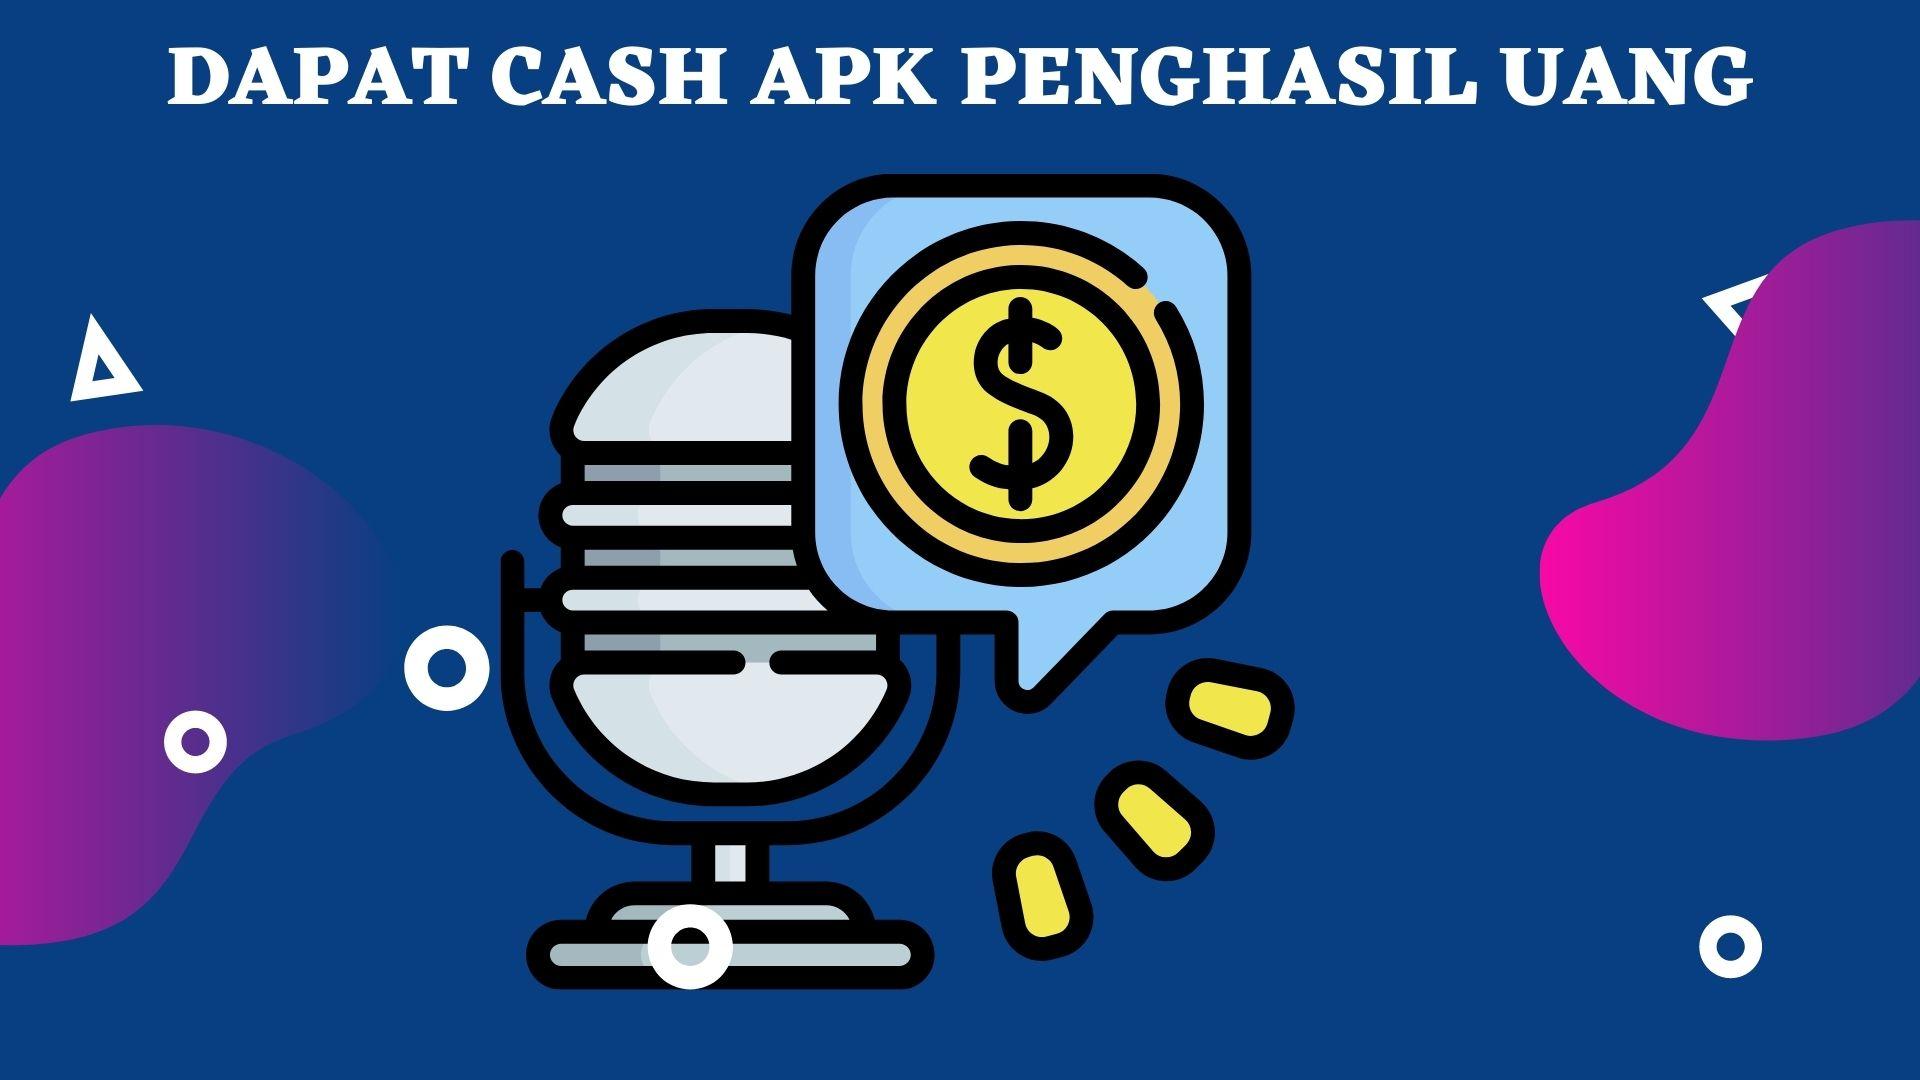 Cara-Mengunduh-Dapat-Cash-APK